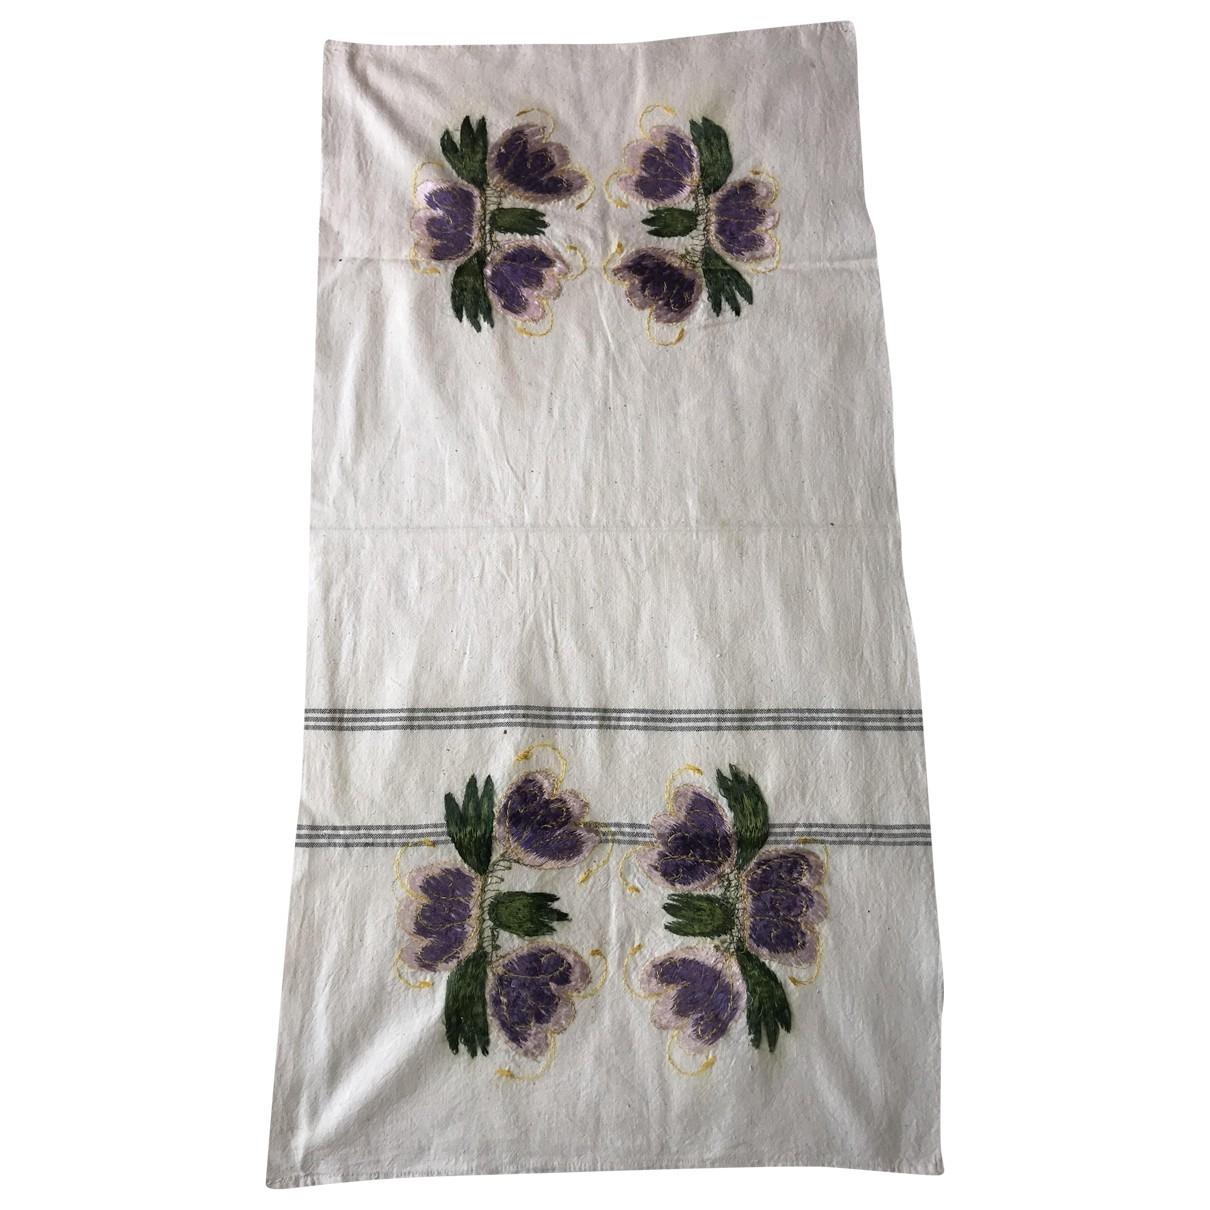 Textil de hogar de Lino Non Signe / Unsigned